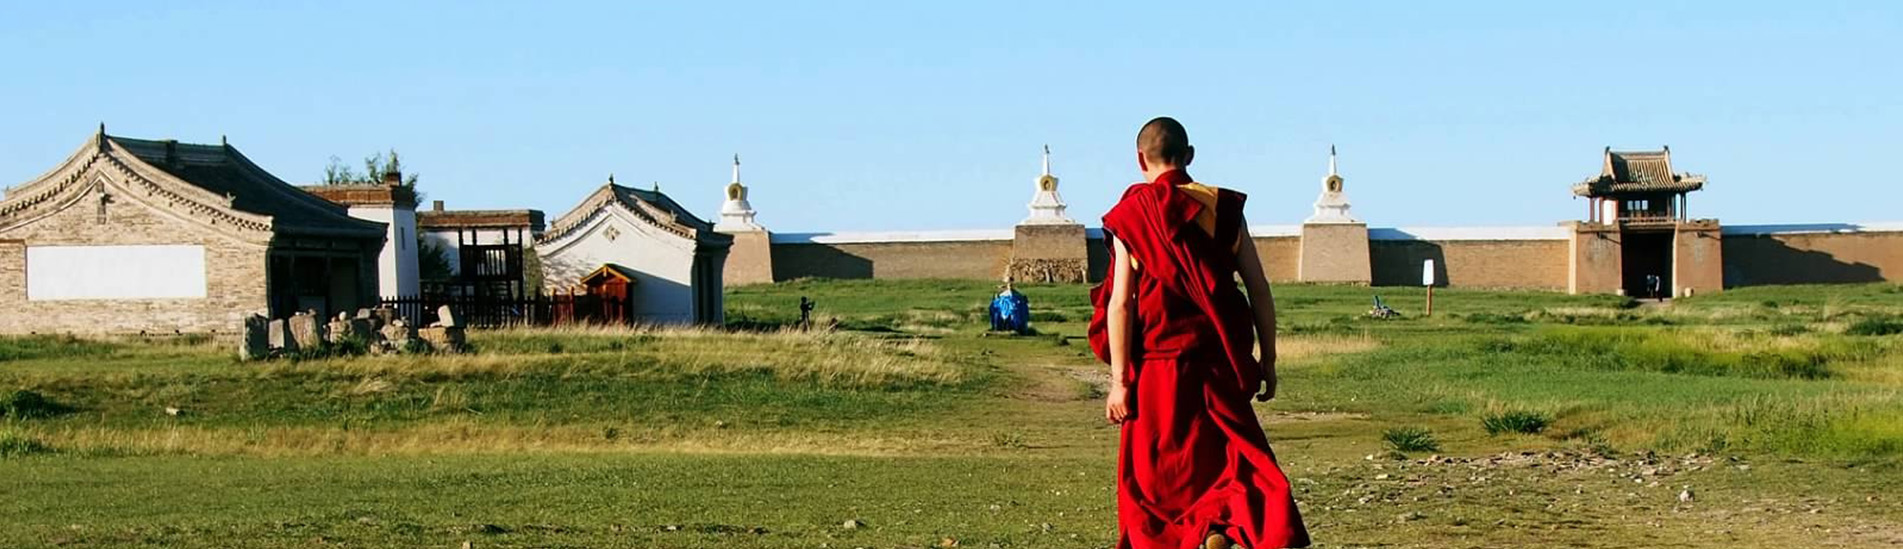 fdbf214cffc Religion in Mongolia